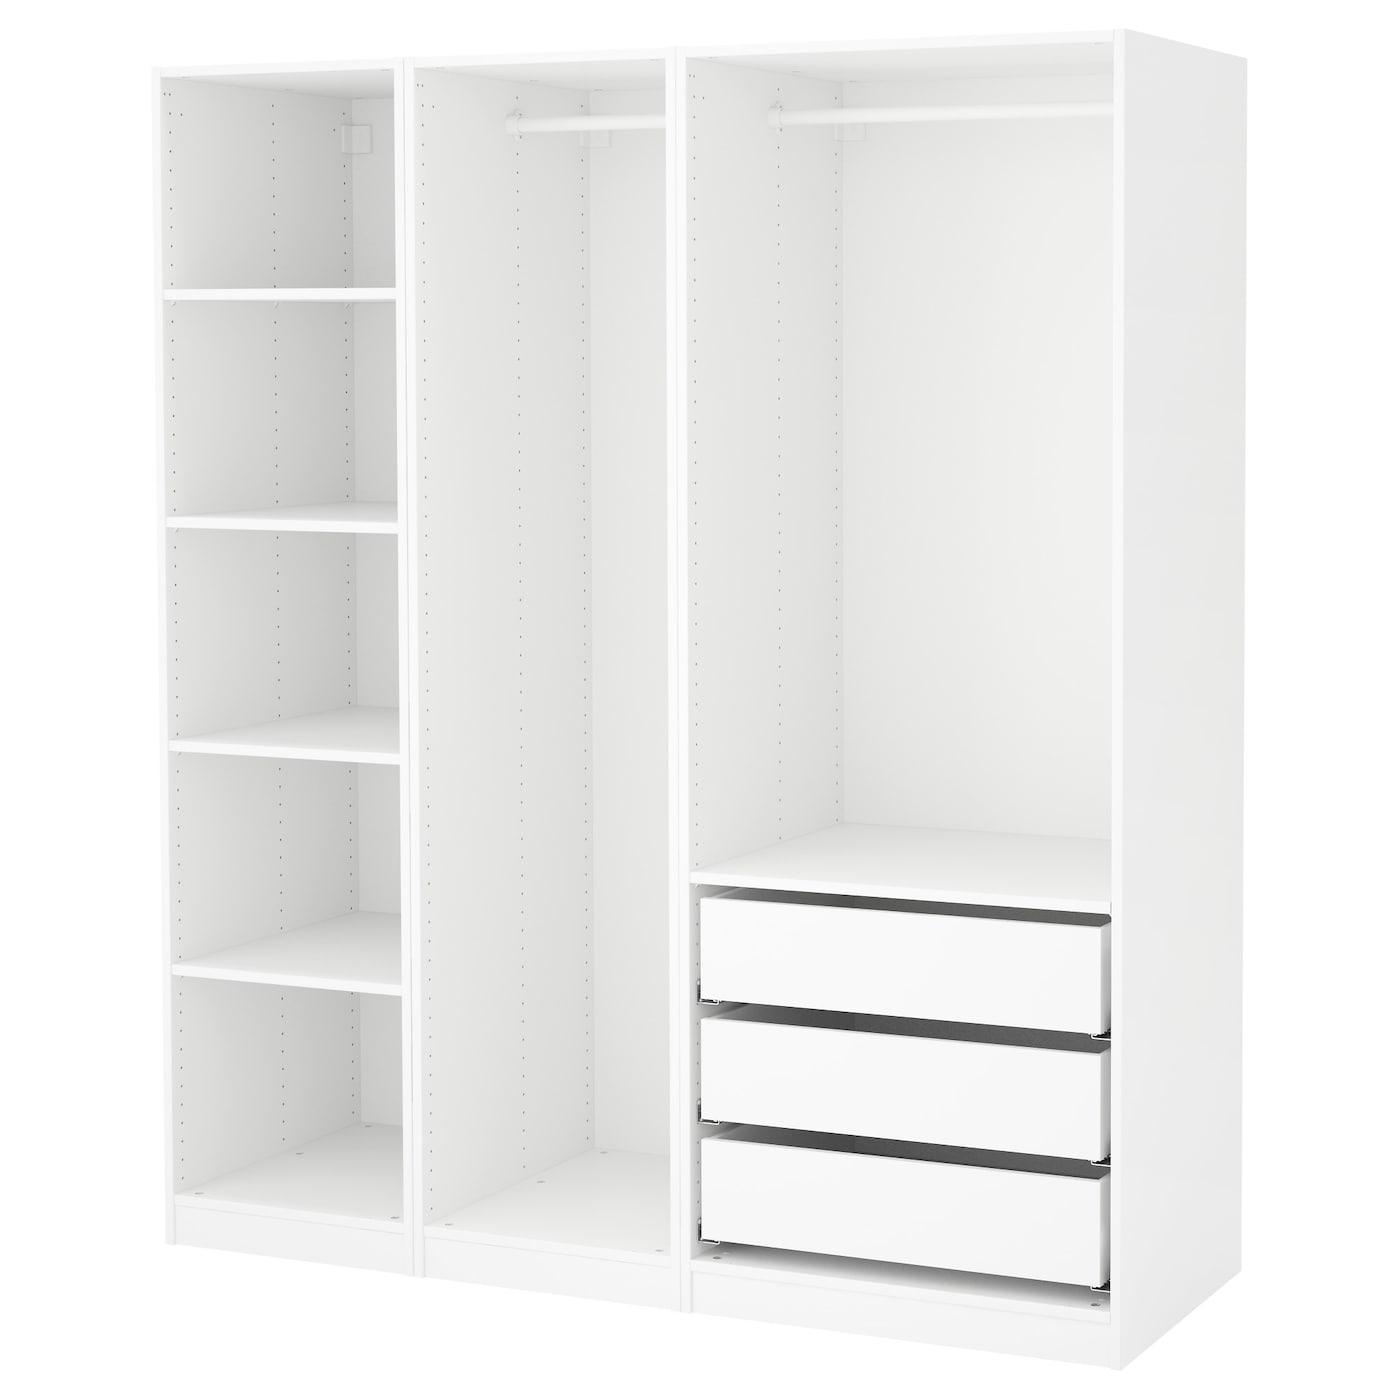 Pax wardrobe white 175x58x201 cm ikea - Dressing ikea komplement ...